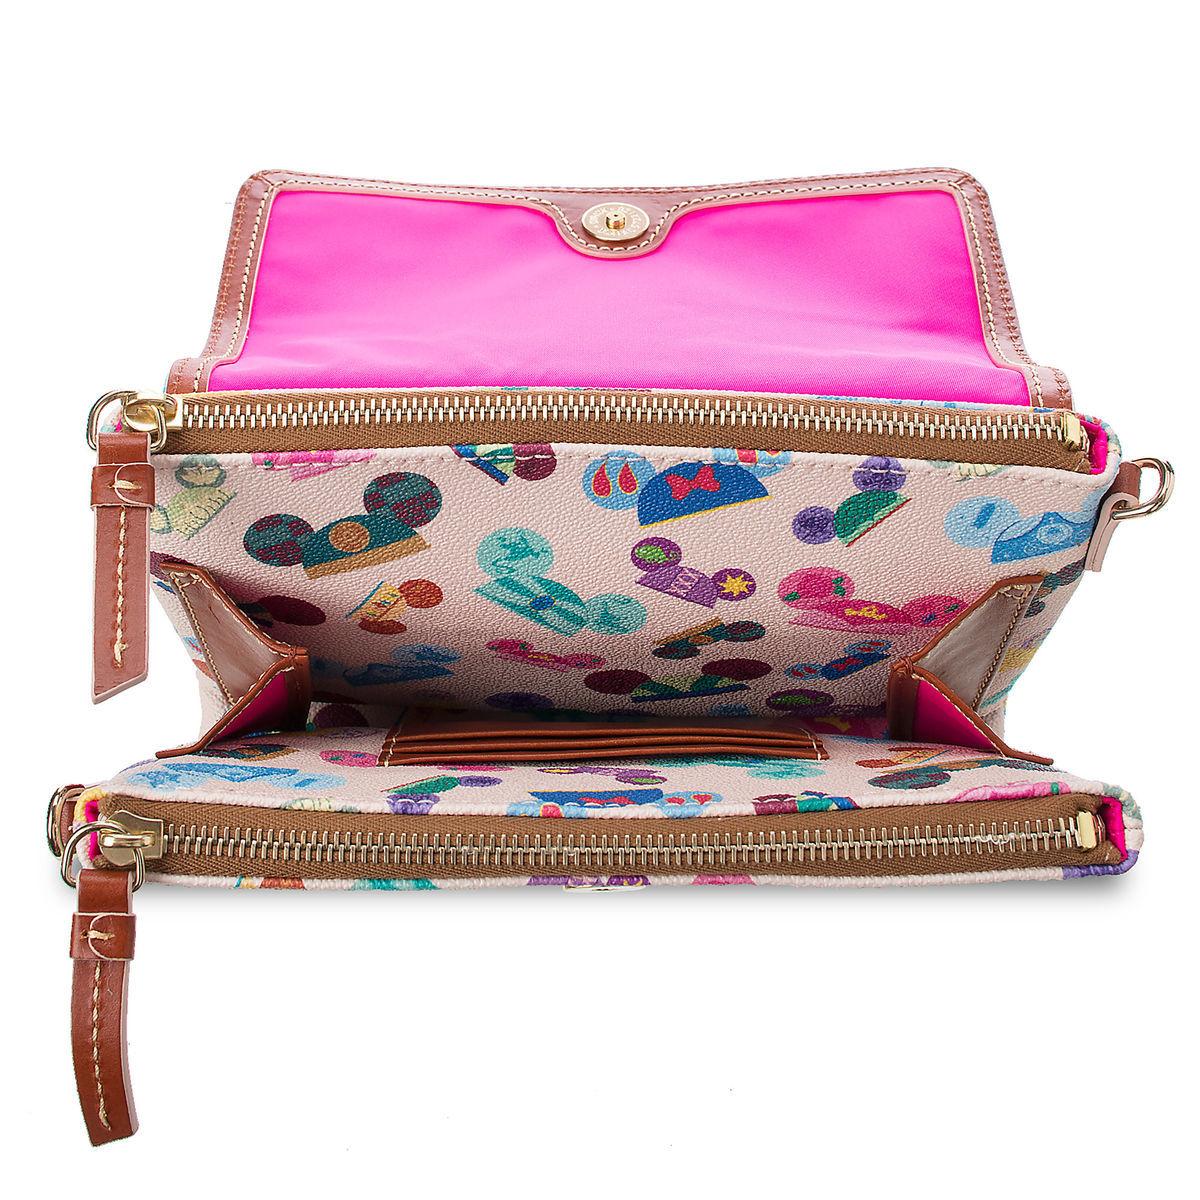 innovative design cef9e b85cf Disney Dooney   Bourke Bag - I Am Princess - Ear Hats - Wristlet. Tap to  expand. Add to Wish List